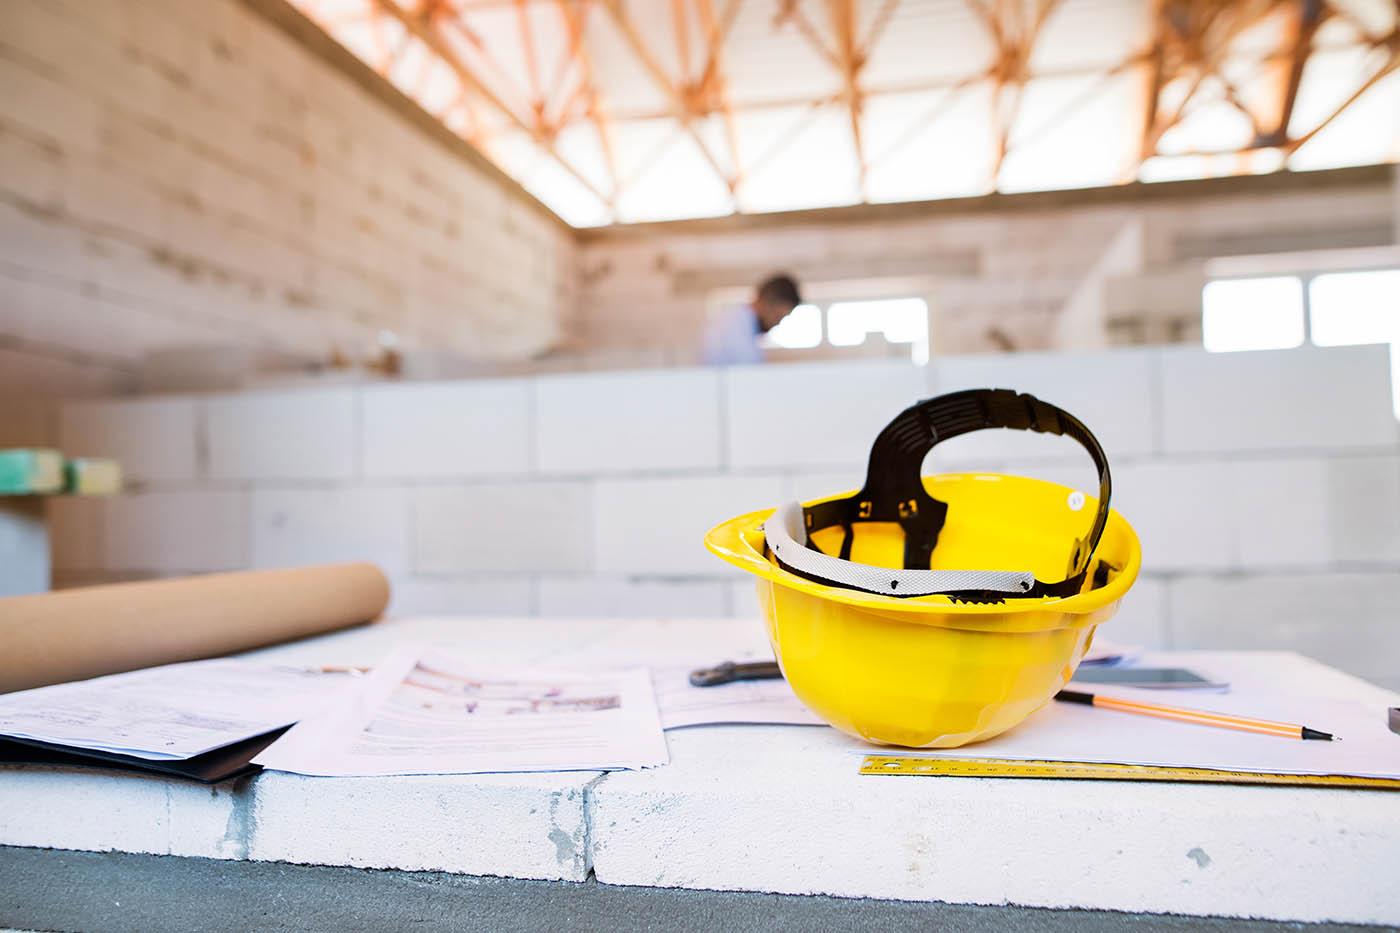 ehitusprojekti ekspertiis